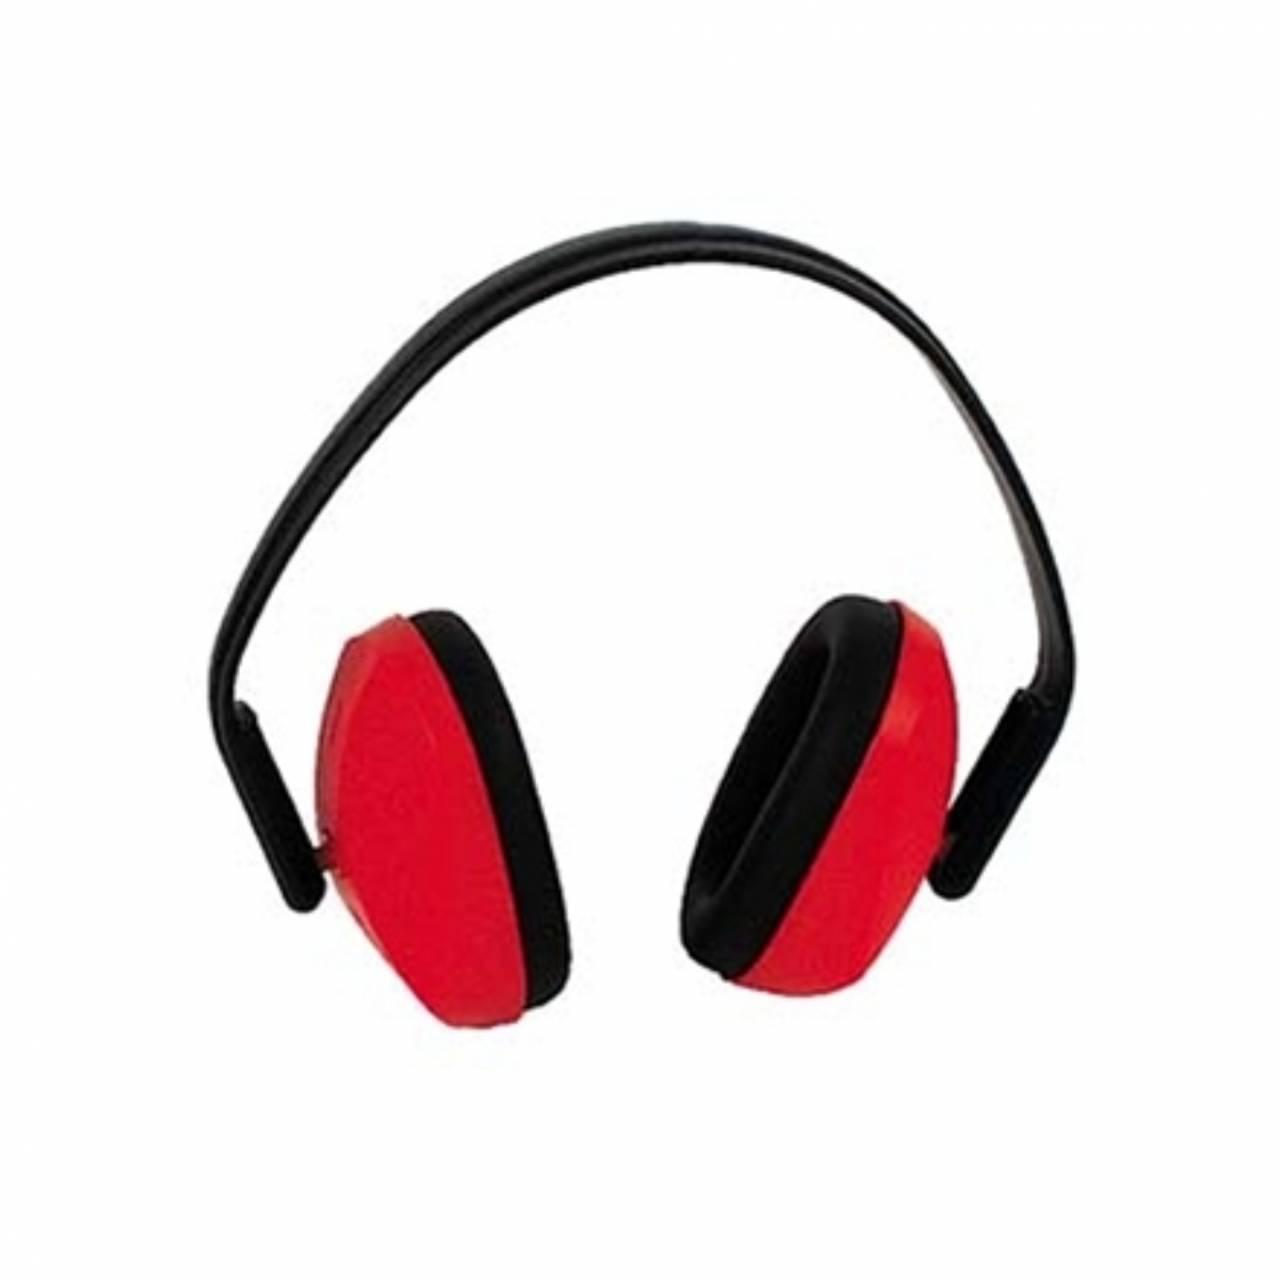 Gehörschutz EN352 'Basis' SNR 23dB